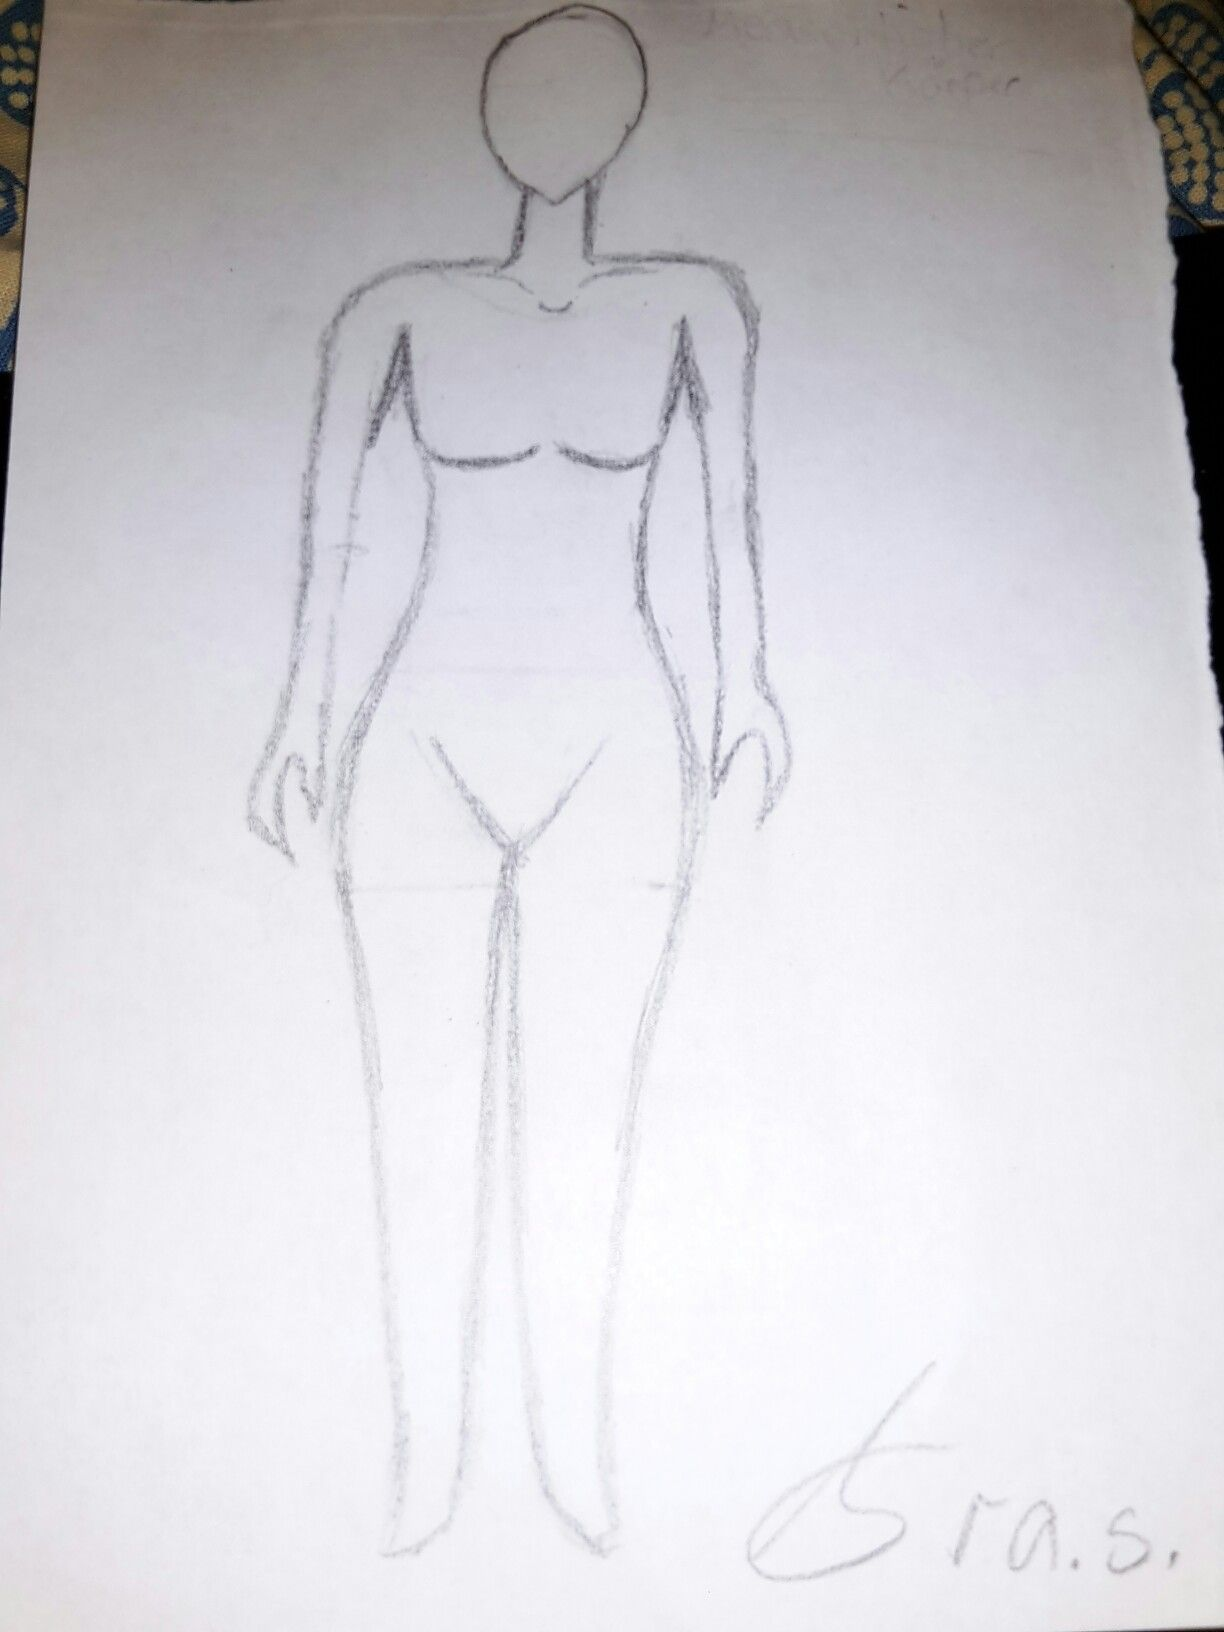 Menschlicher Körper einer Frau | manga | Pinterest | Manga